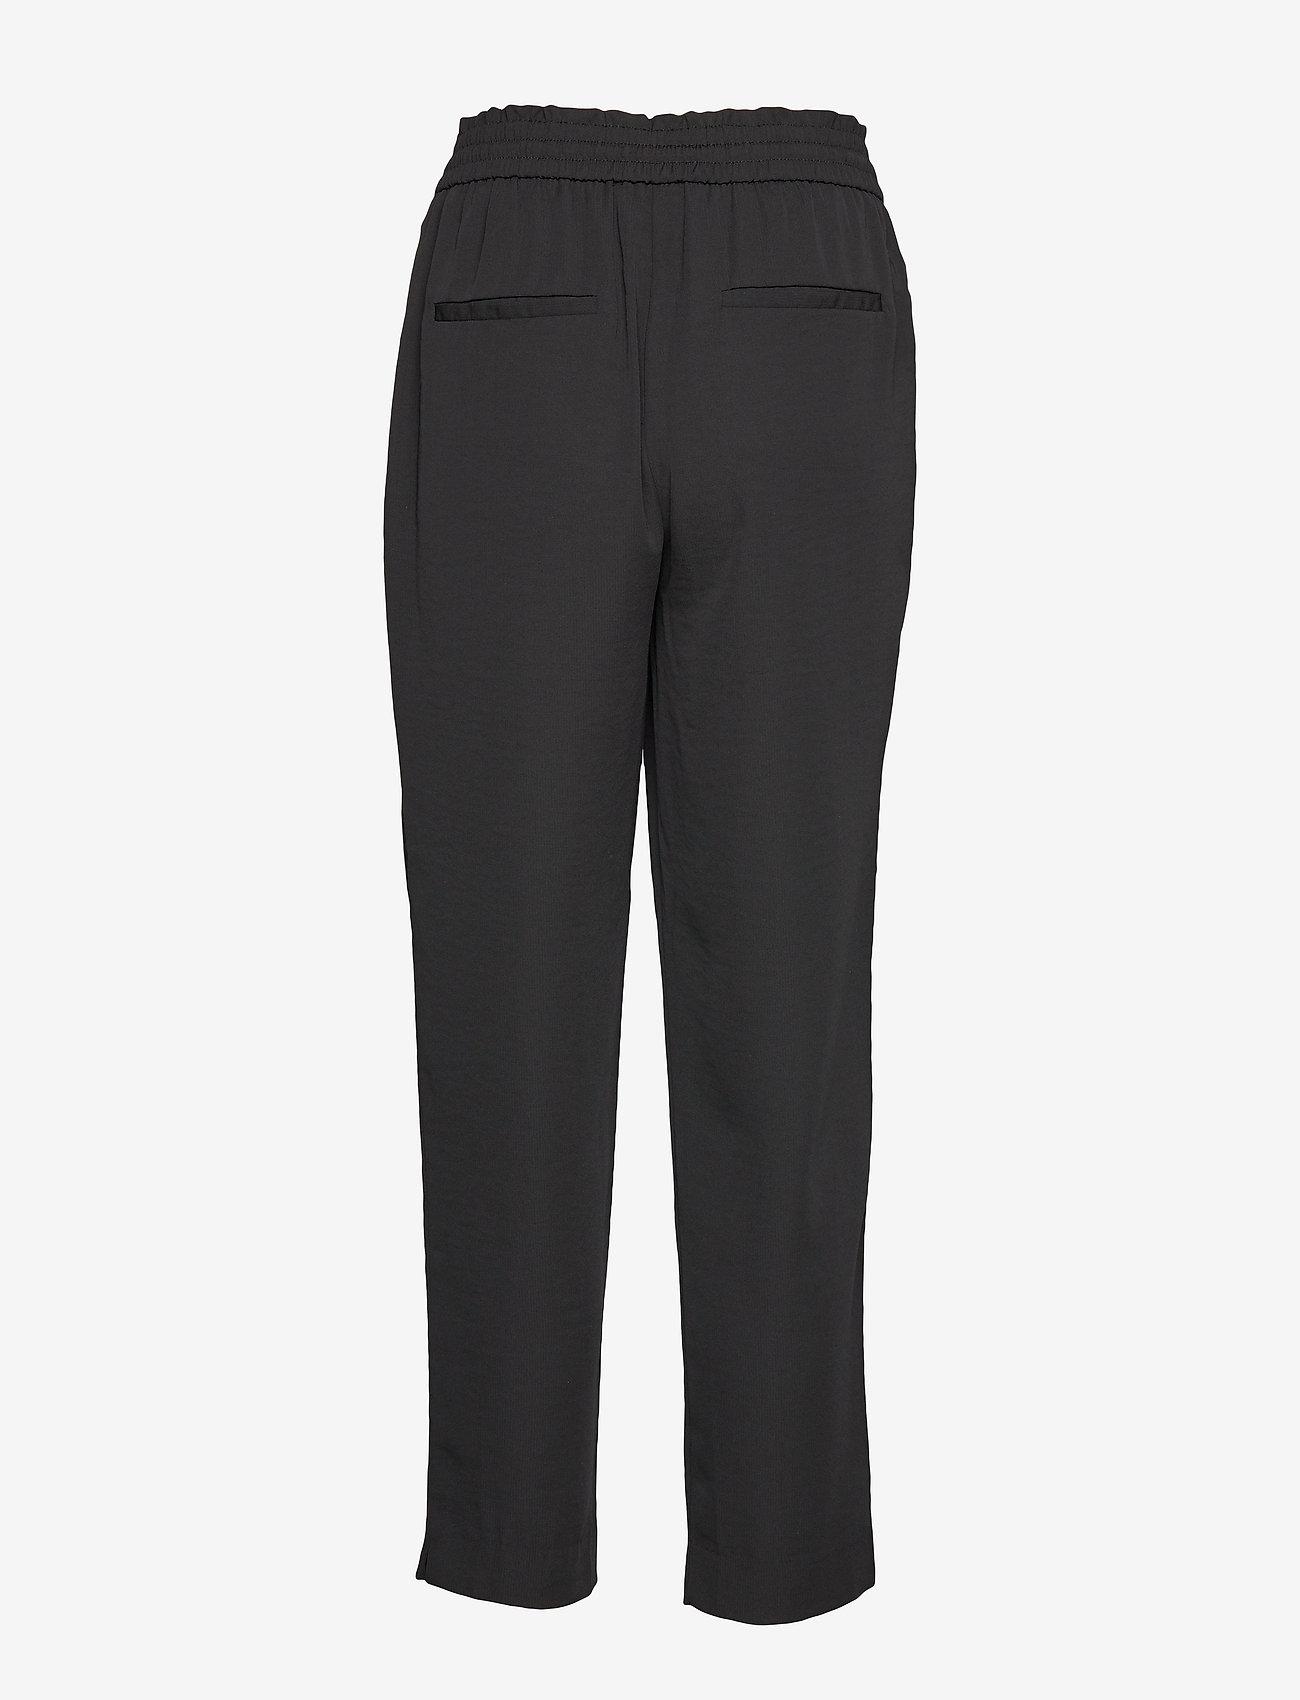 Vila - VIIRIS RWRE 7/8 PANT - NOOS - casual trousers - black - 1